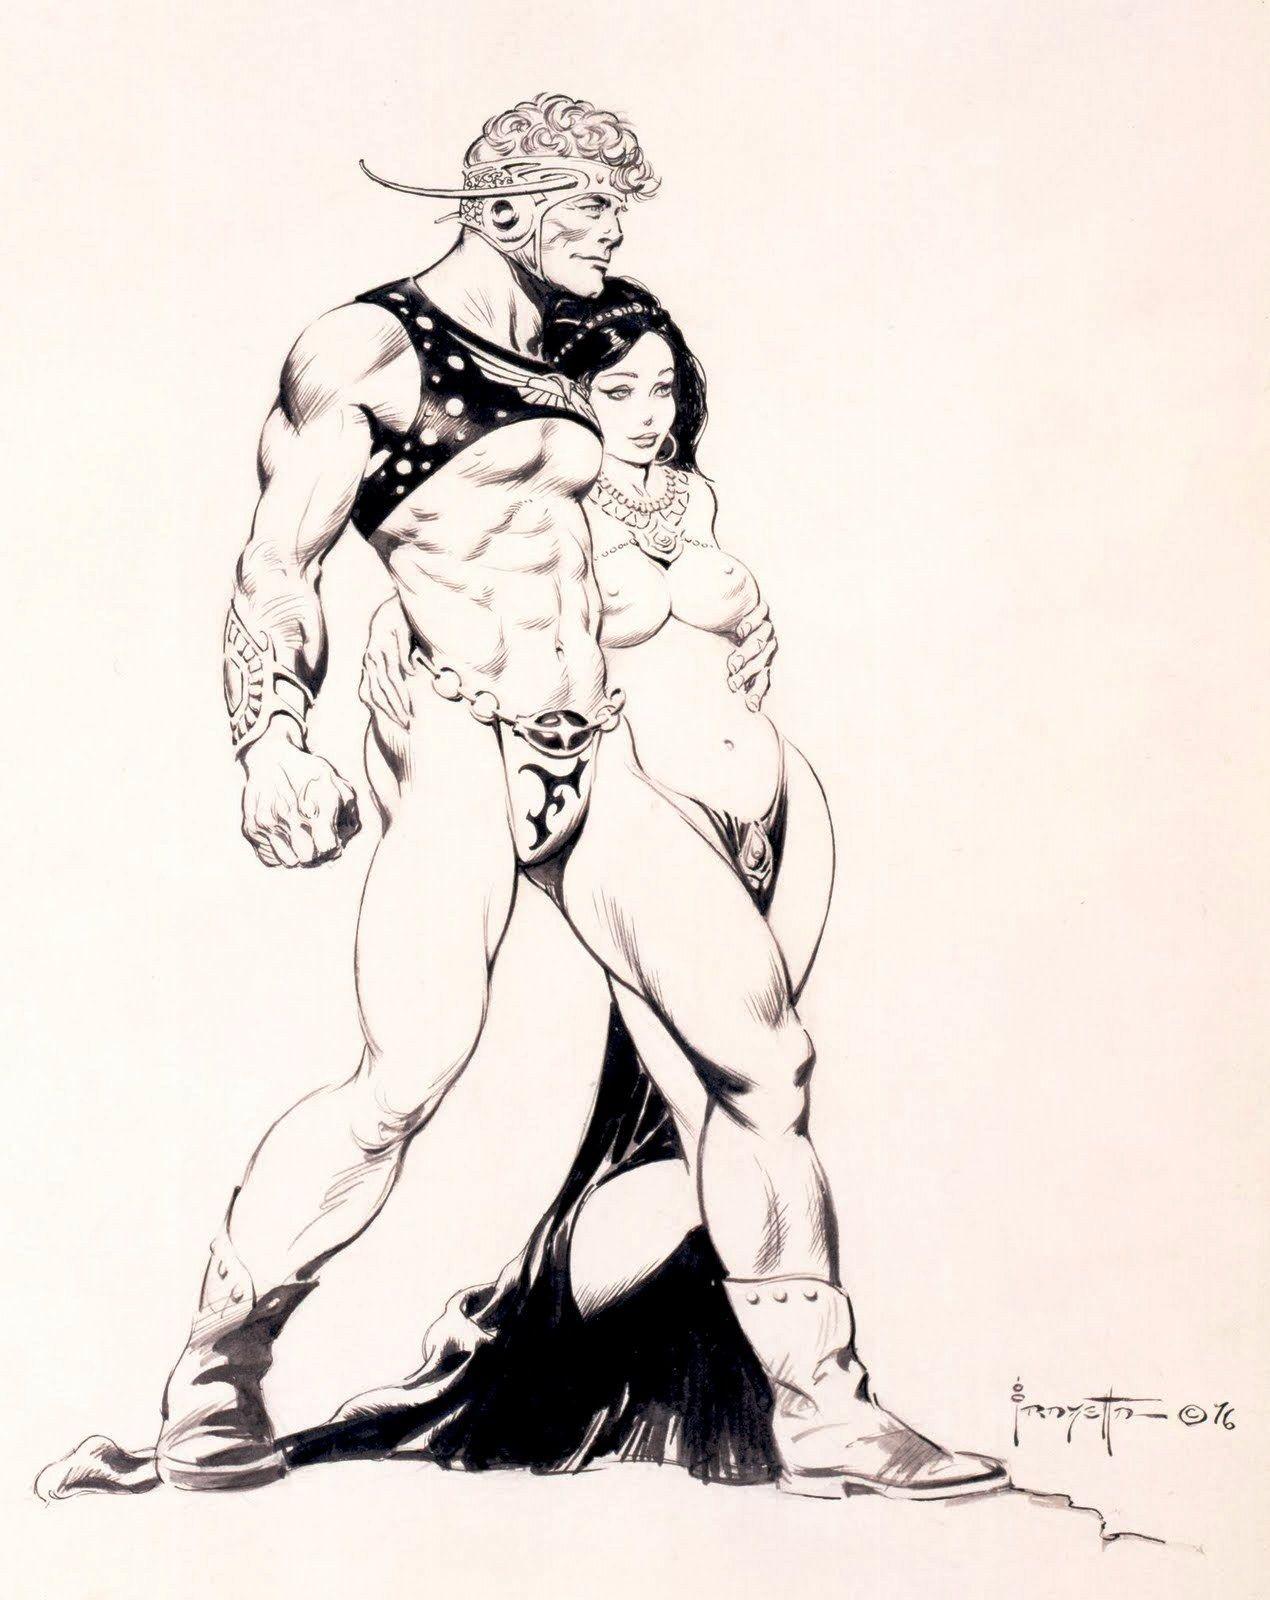 Flash Gordon by Frank Frazetta | Frezetta. | Pinterest | Grafiken